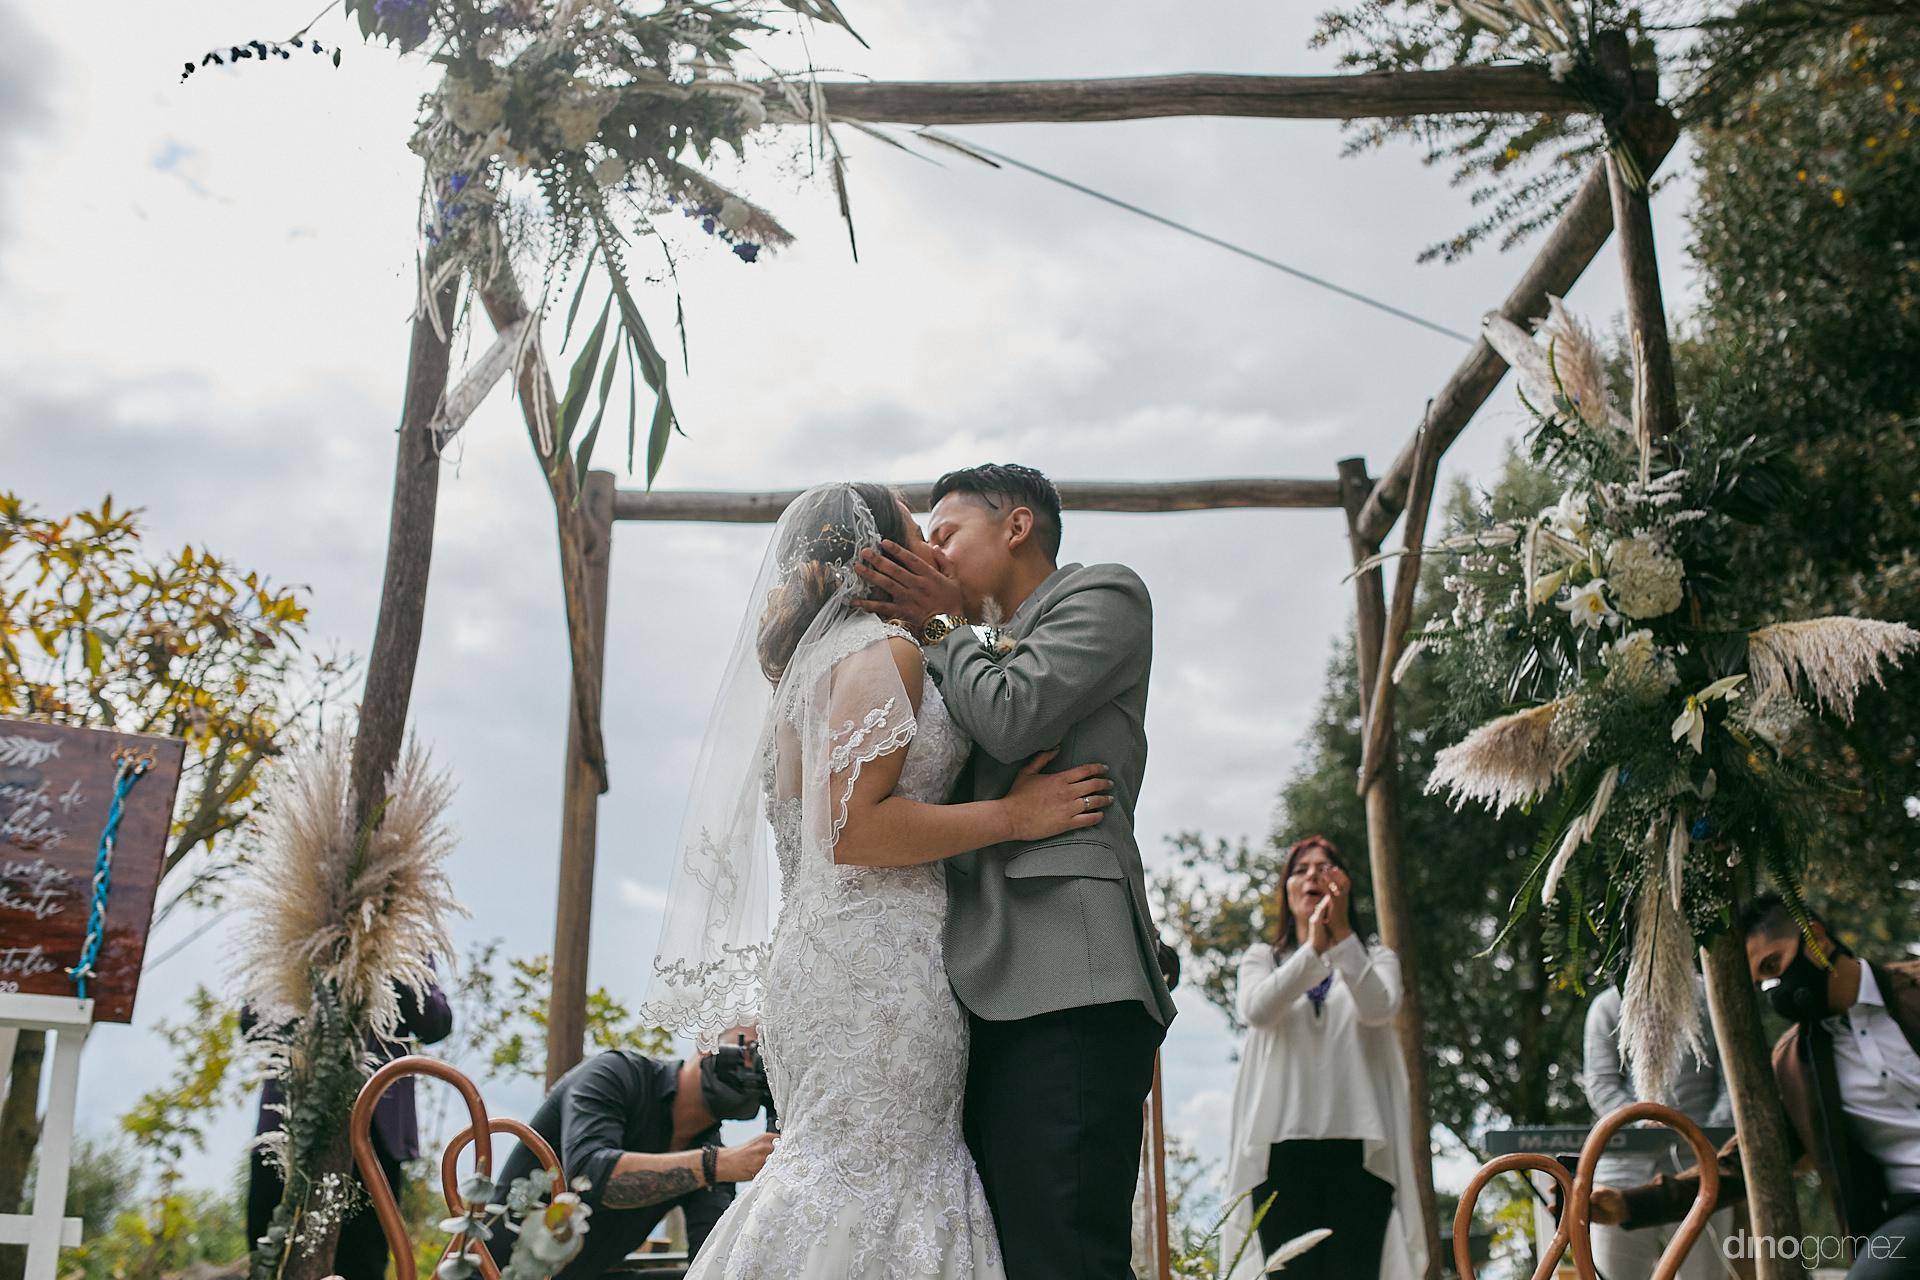 039 - Diy Budget Destination Weddings Can Be Prety Too!